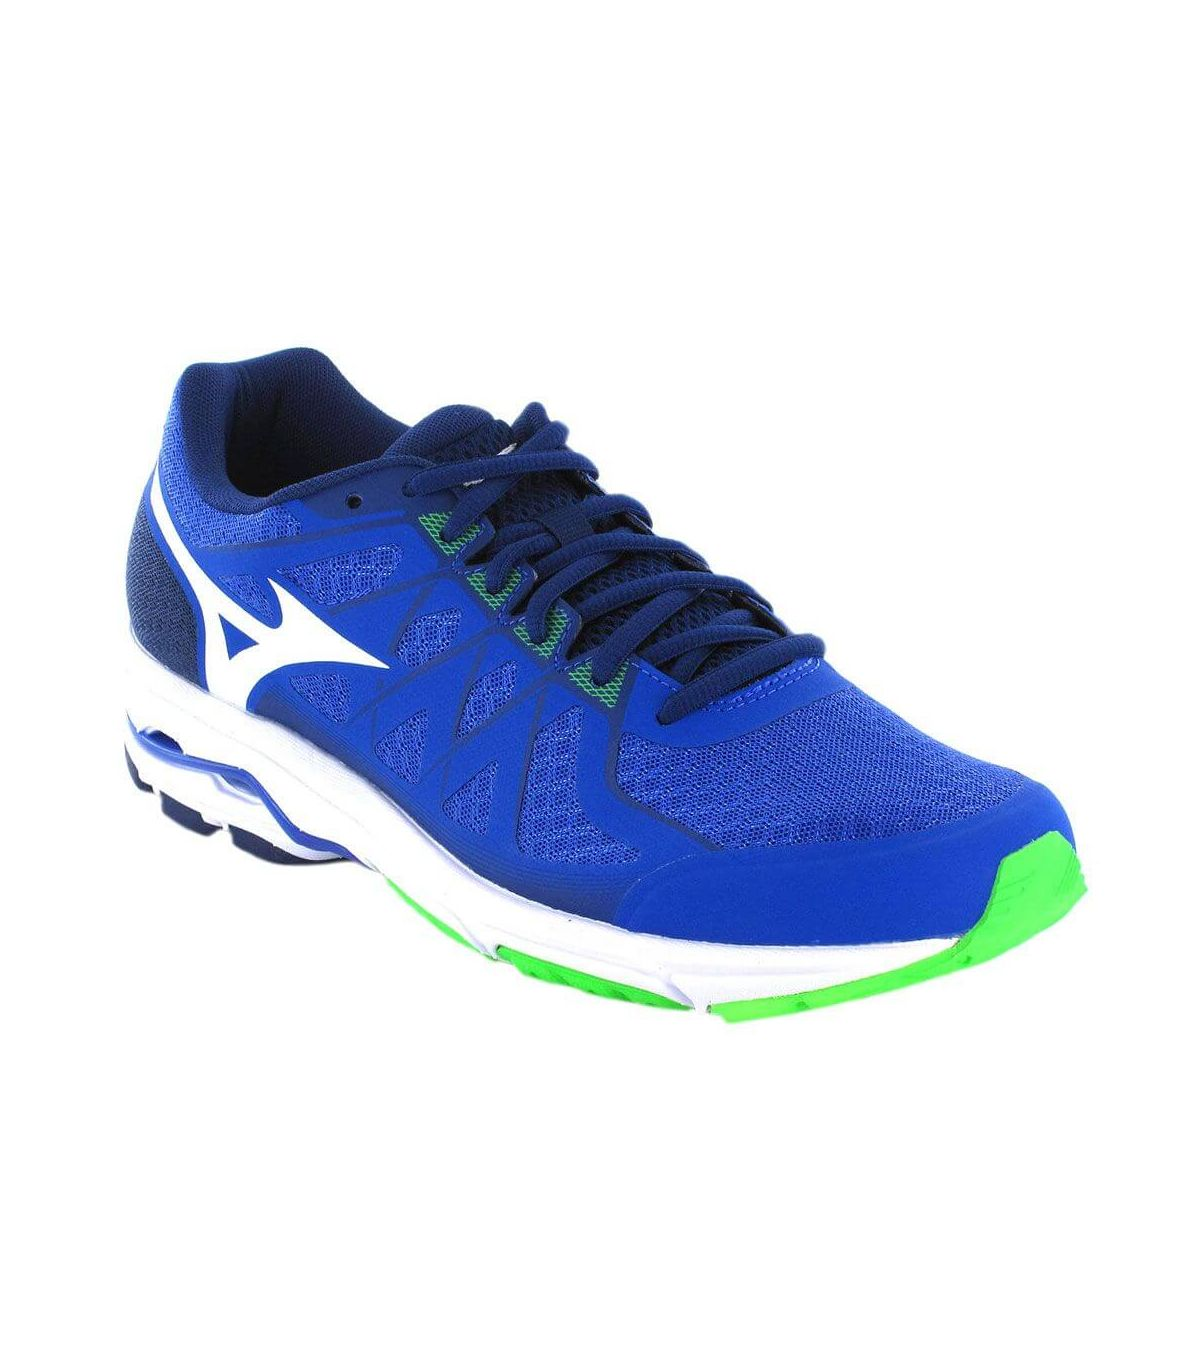 Mizuno Wave Unitus 4 Mizuno Zapatillas Running Hombre Zapatillas Running Tallas: 42, 42,5, 43, 44, 44,5, 46; Color: azul